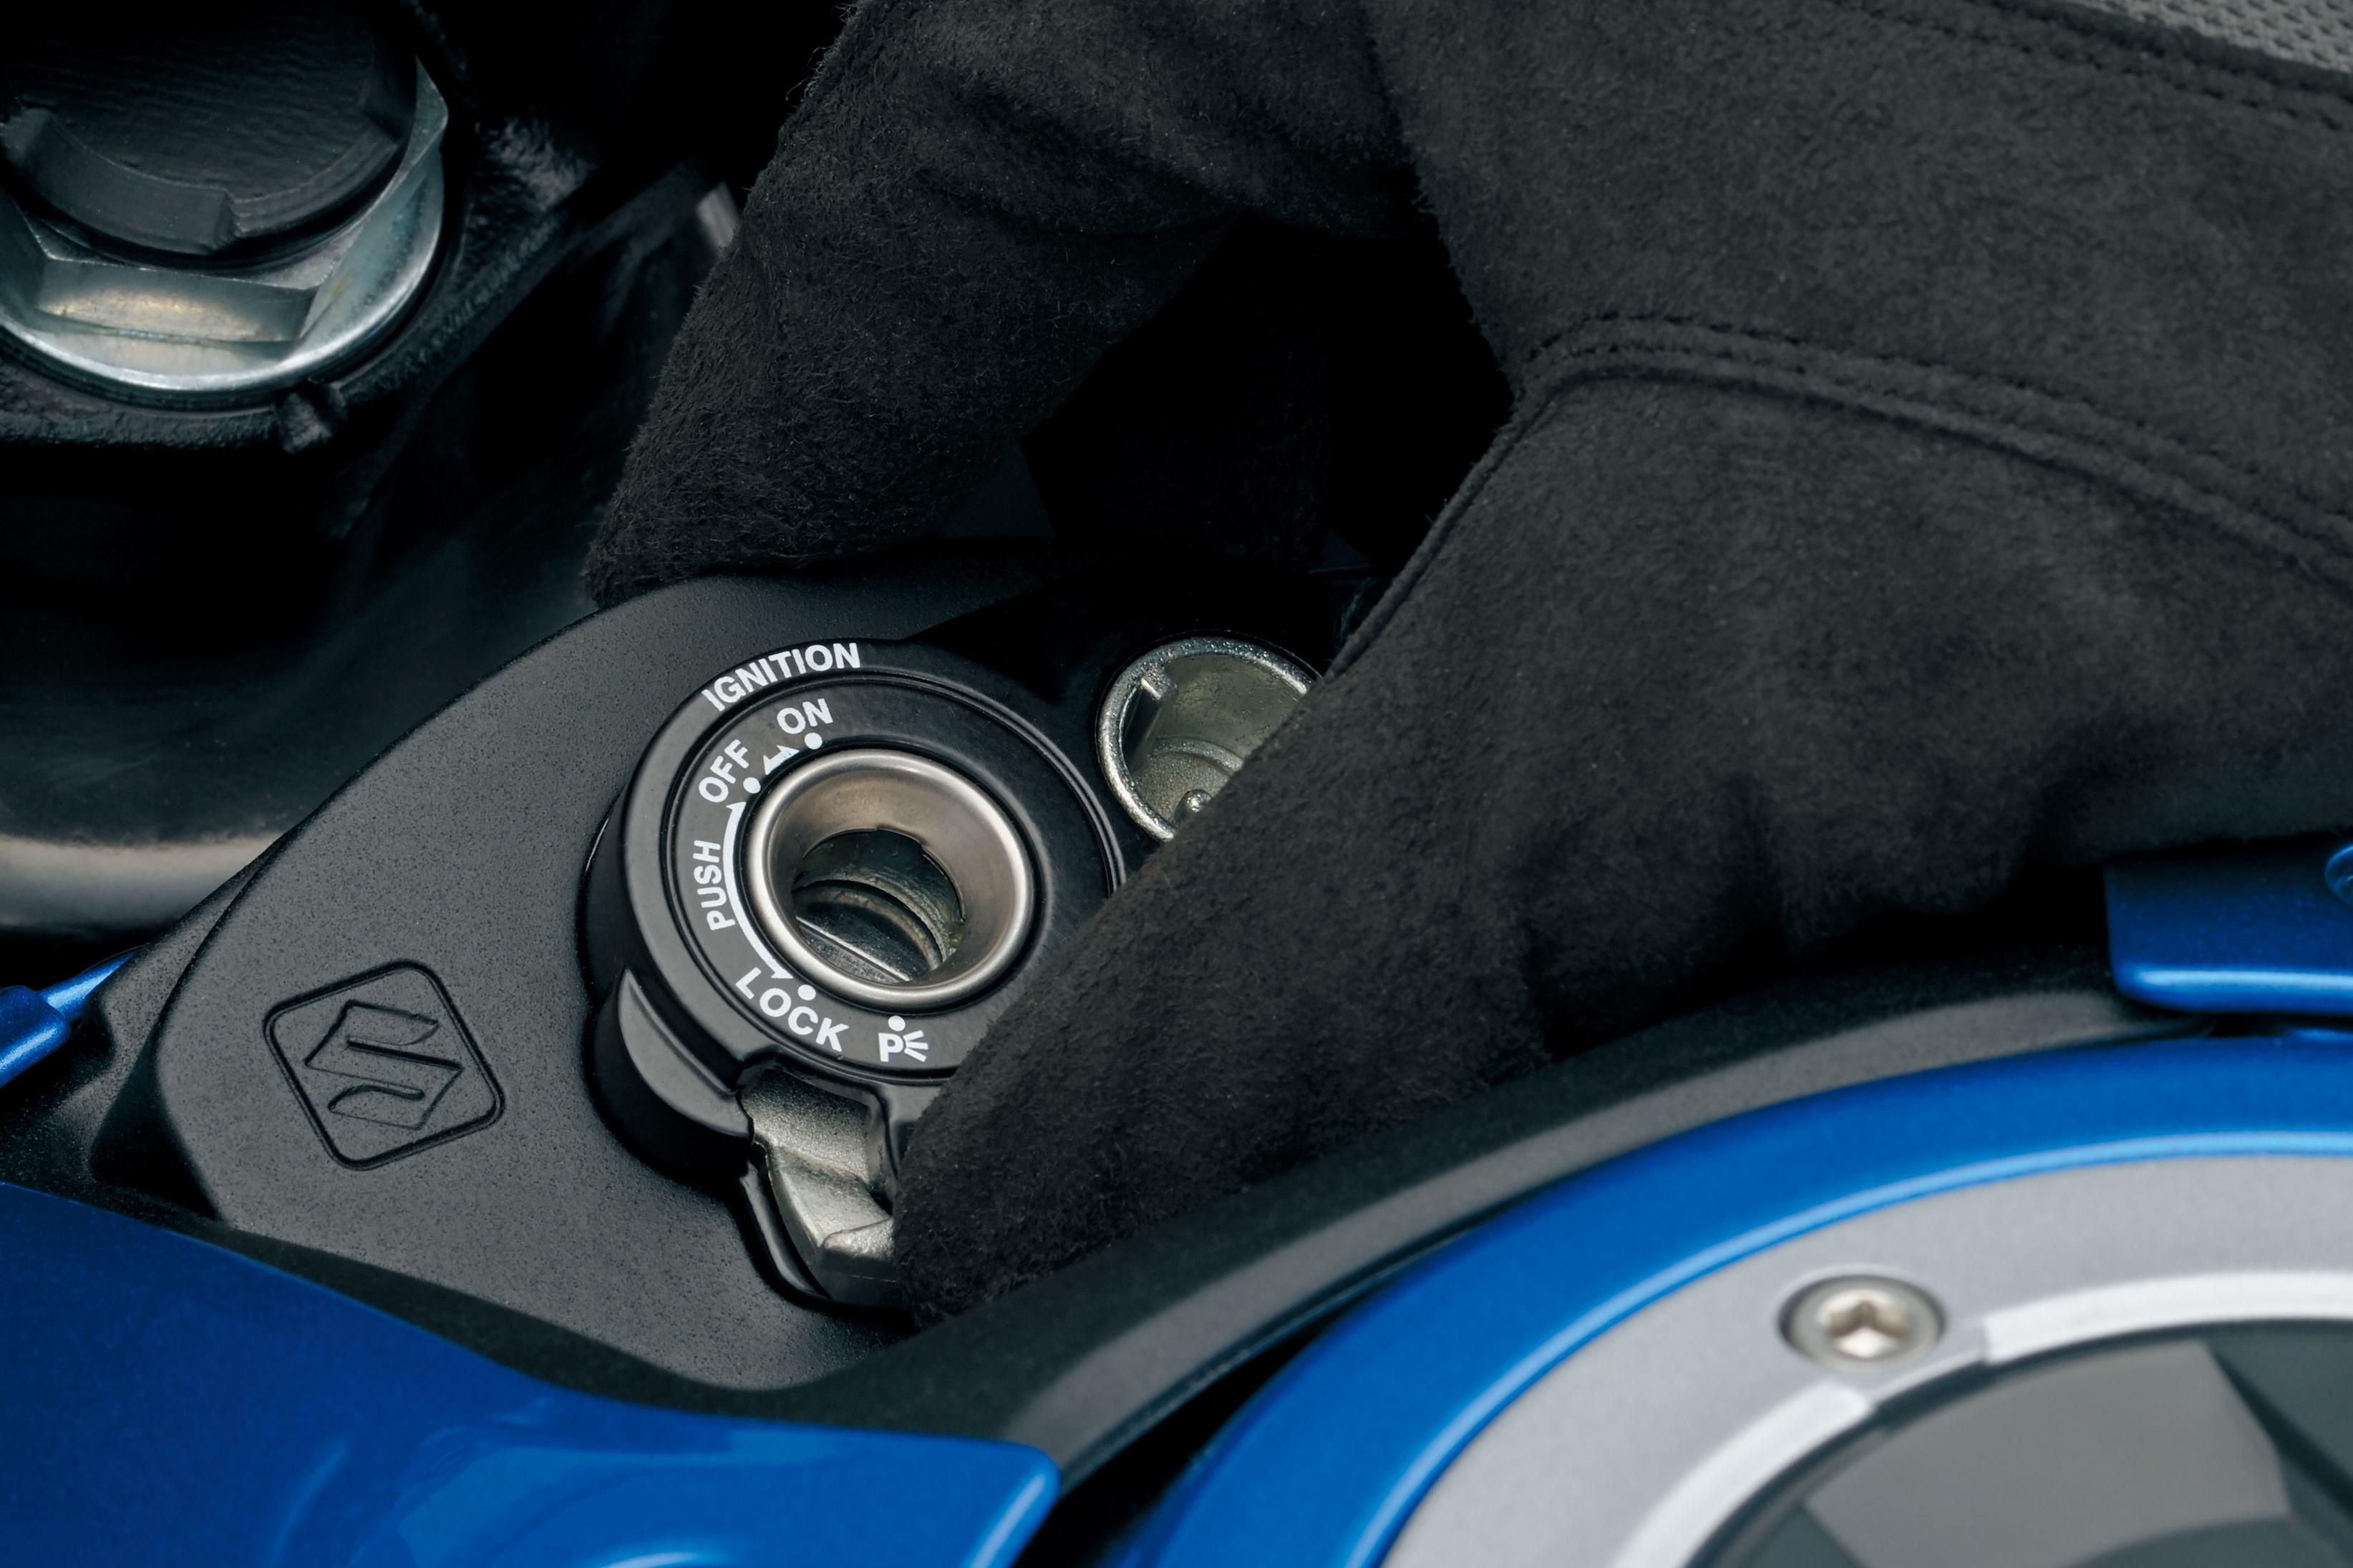 Suzuki GSX-S125 key system